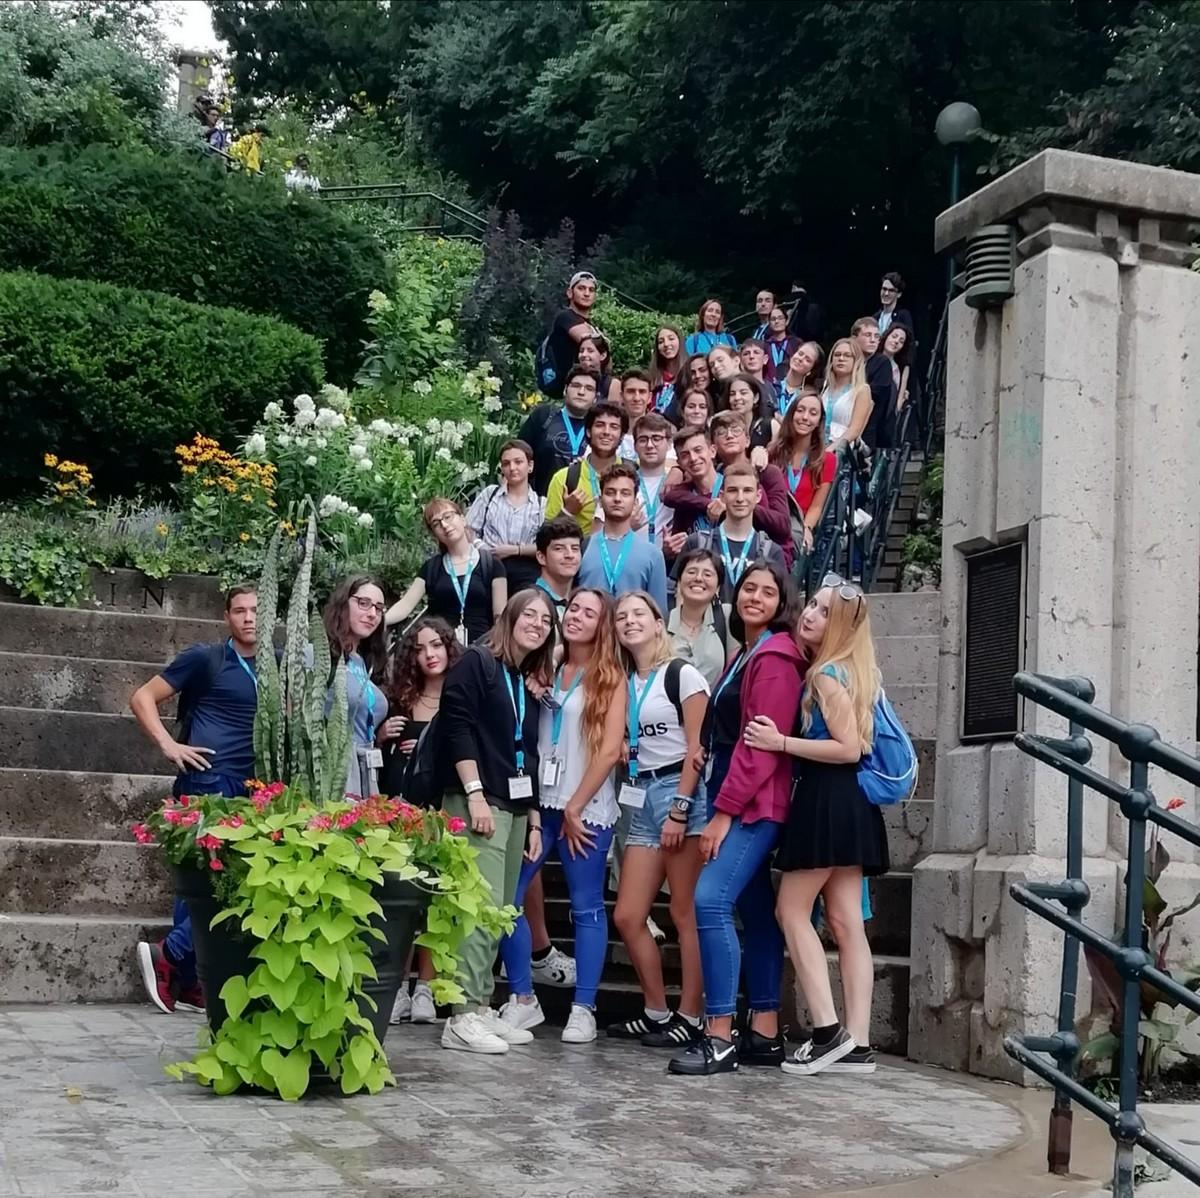 9 Agosto 2019 Archivi - Giocamondo Study-TORONTO-YORK-UNIVERSITY-TURNO-2-GIORNO-12-5-